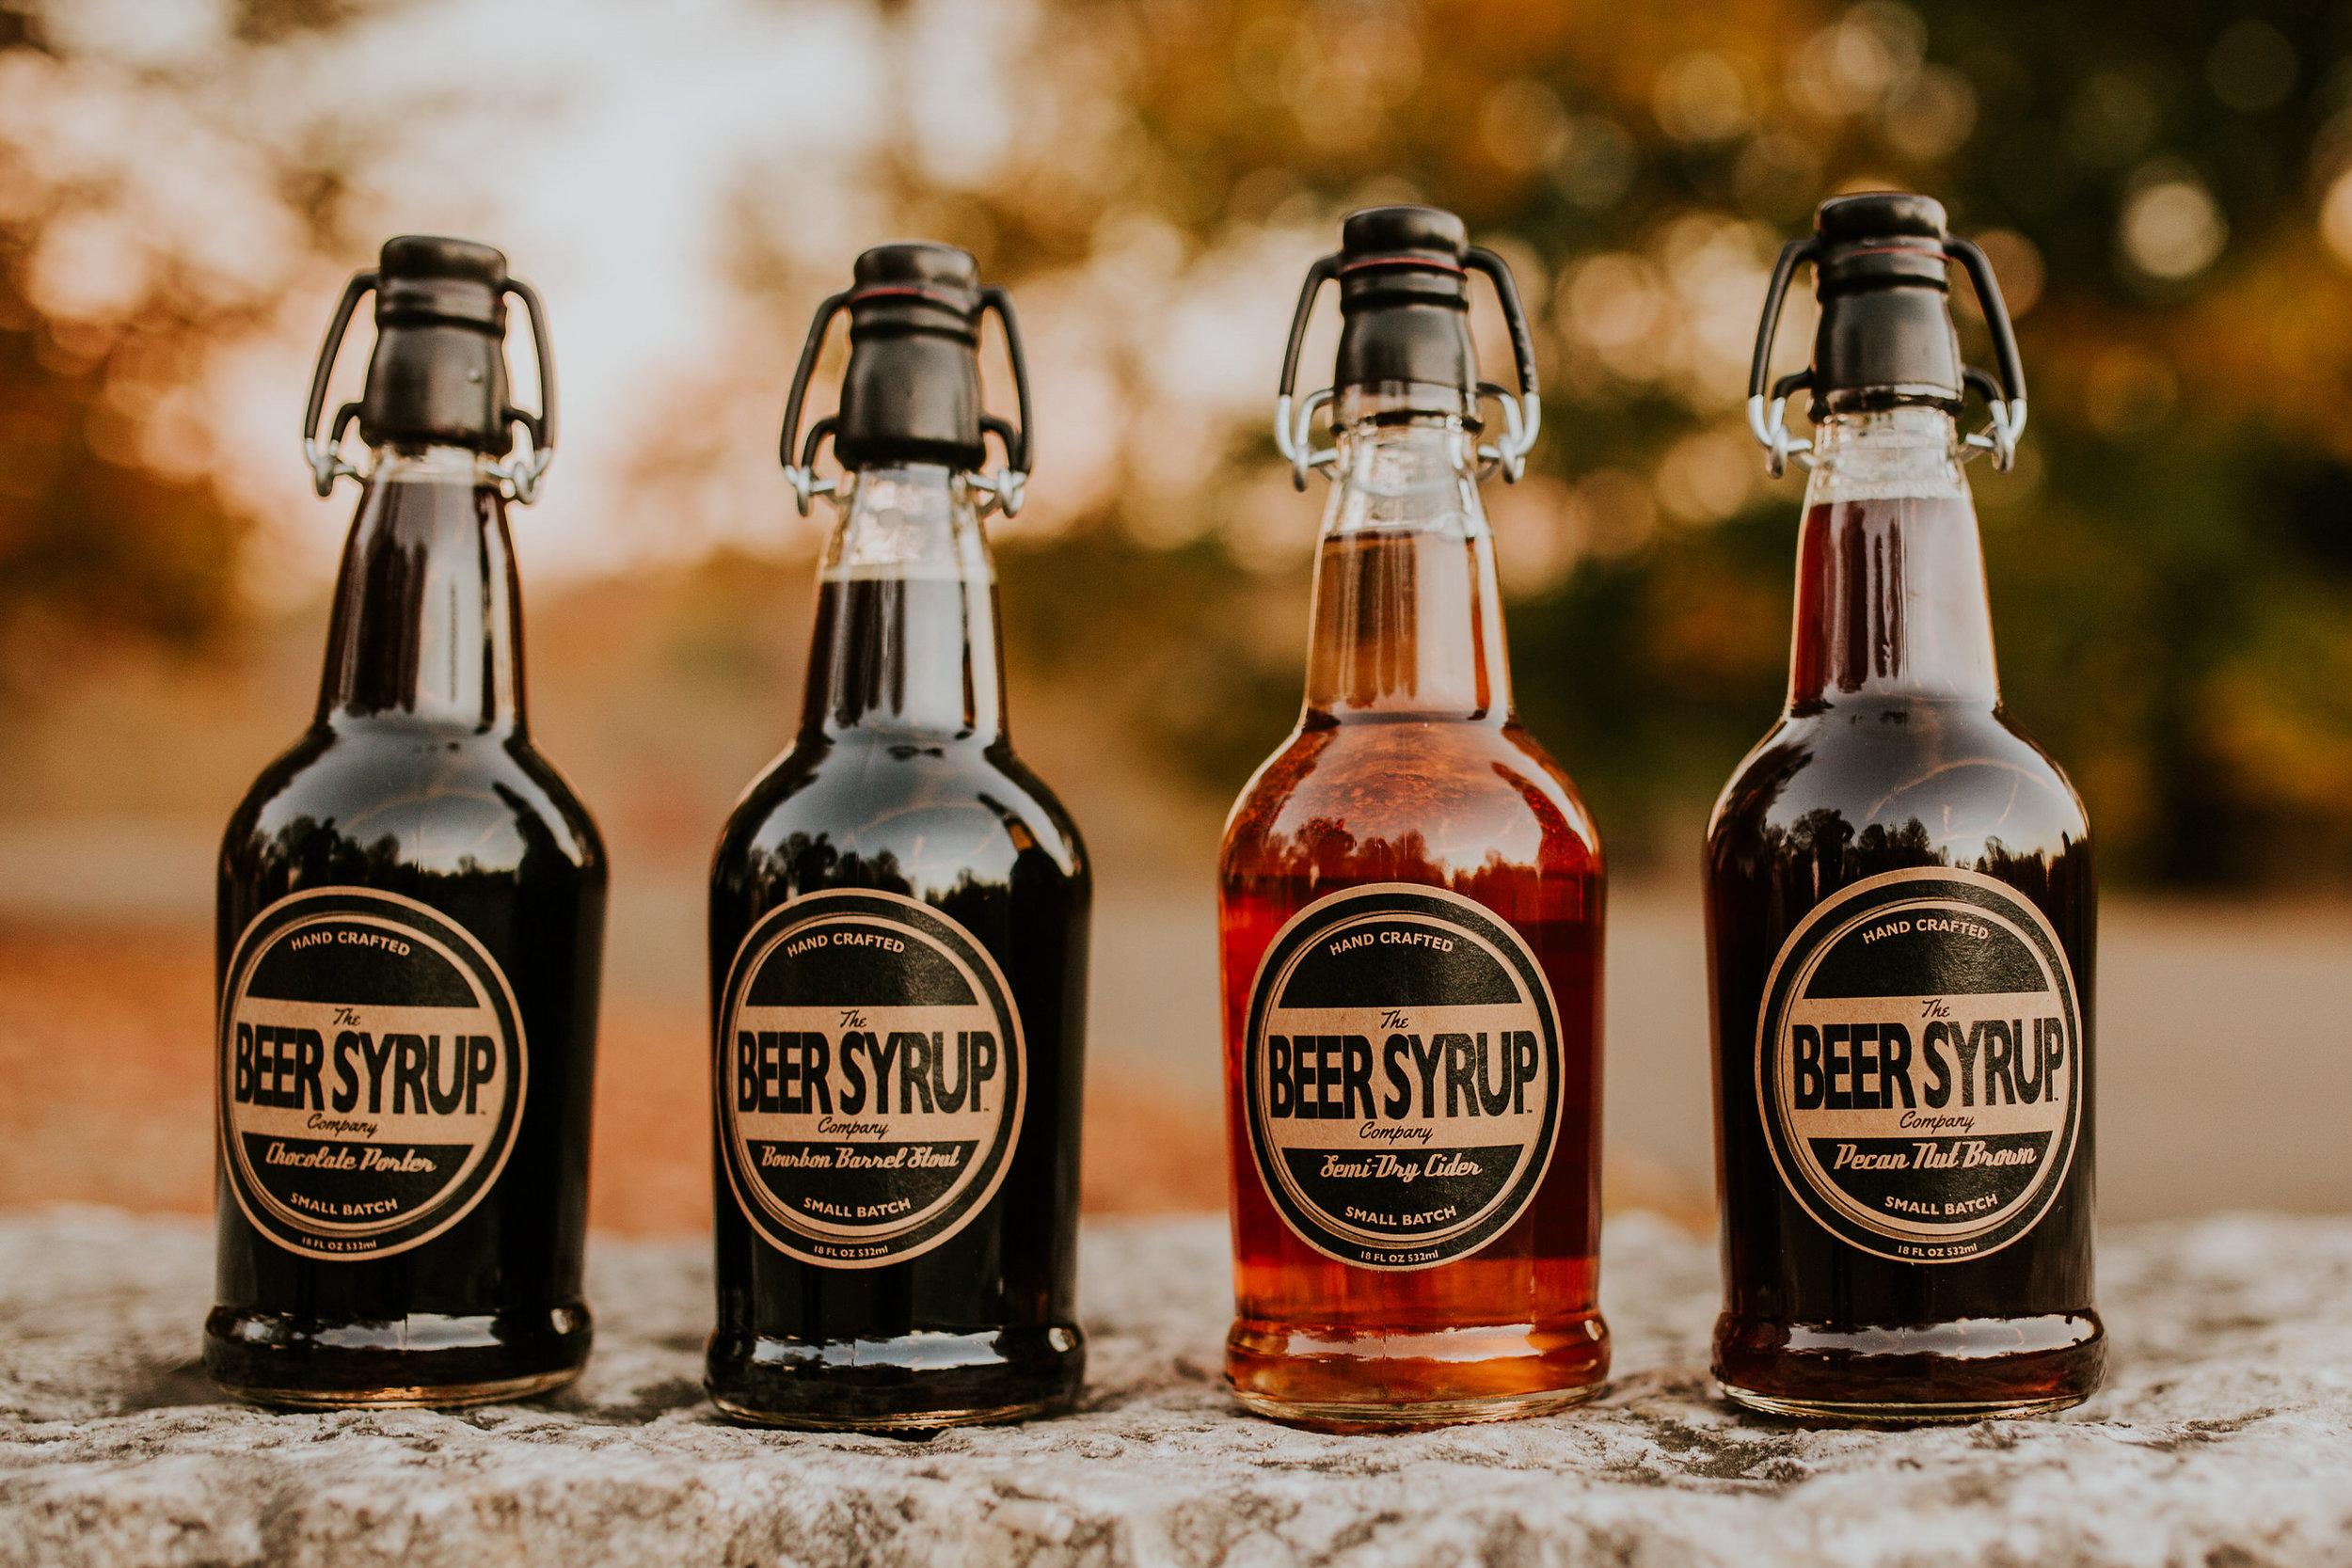 18oz Beer Syrup Bottles (Erin Trimble Photo).jpg